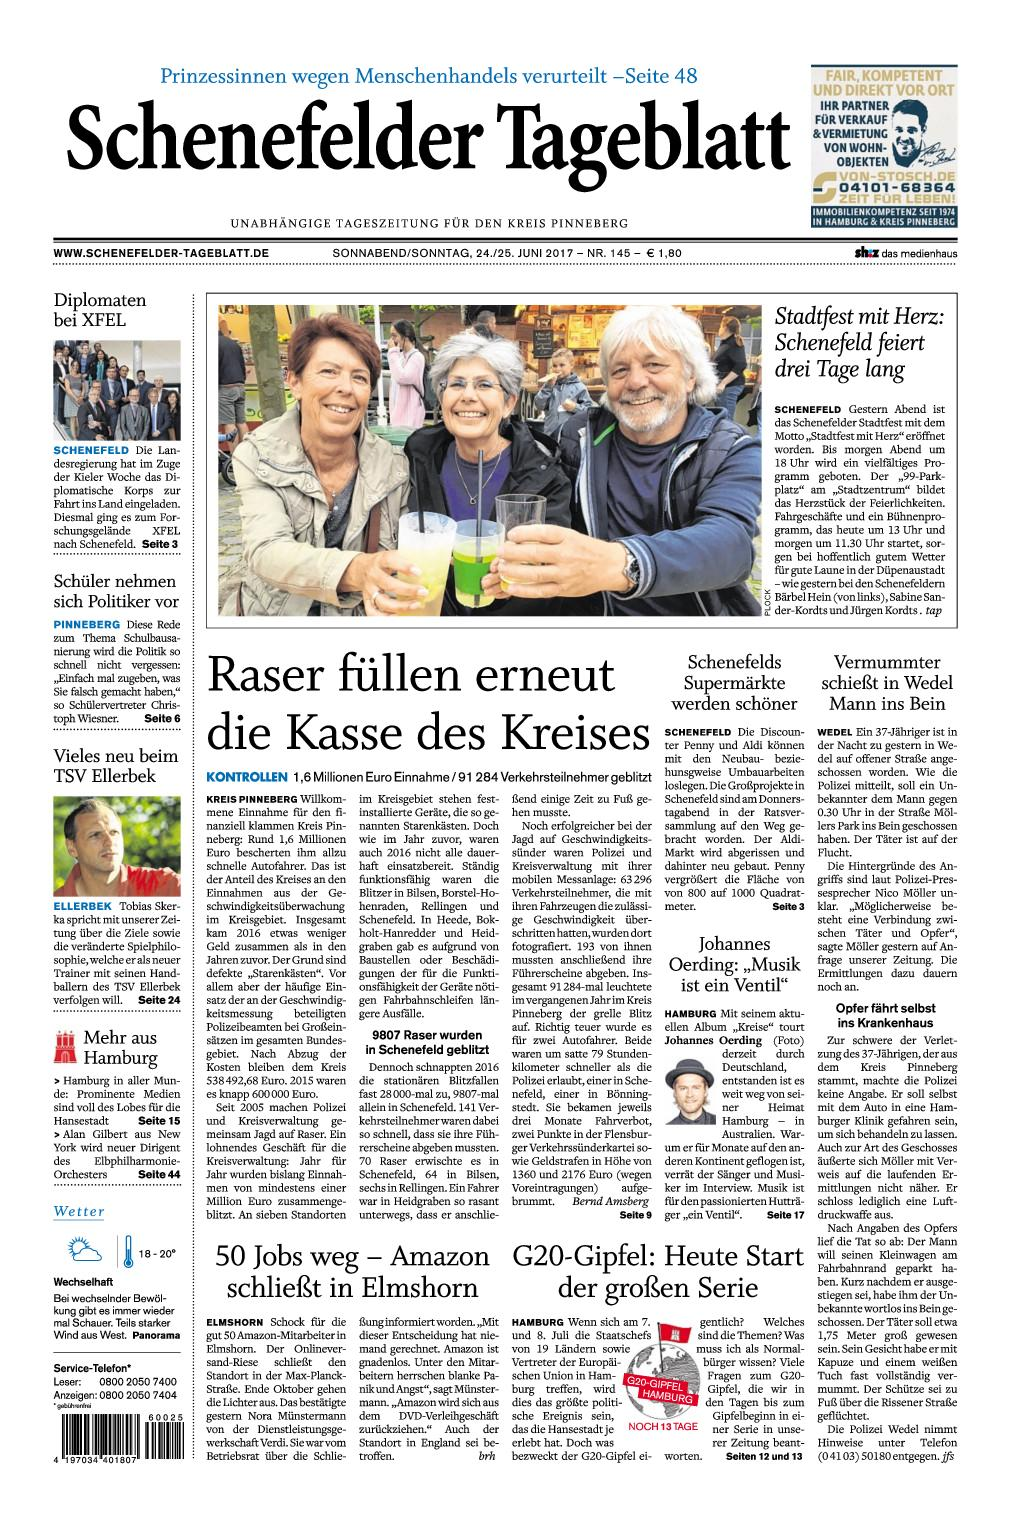 Schenefelder Tageblatt 24 Juni 2017